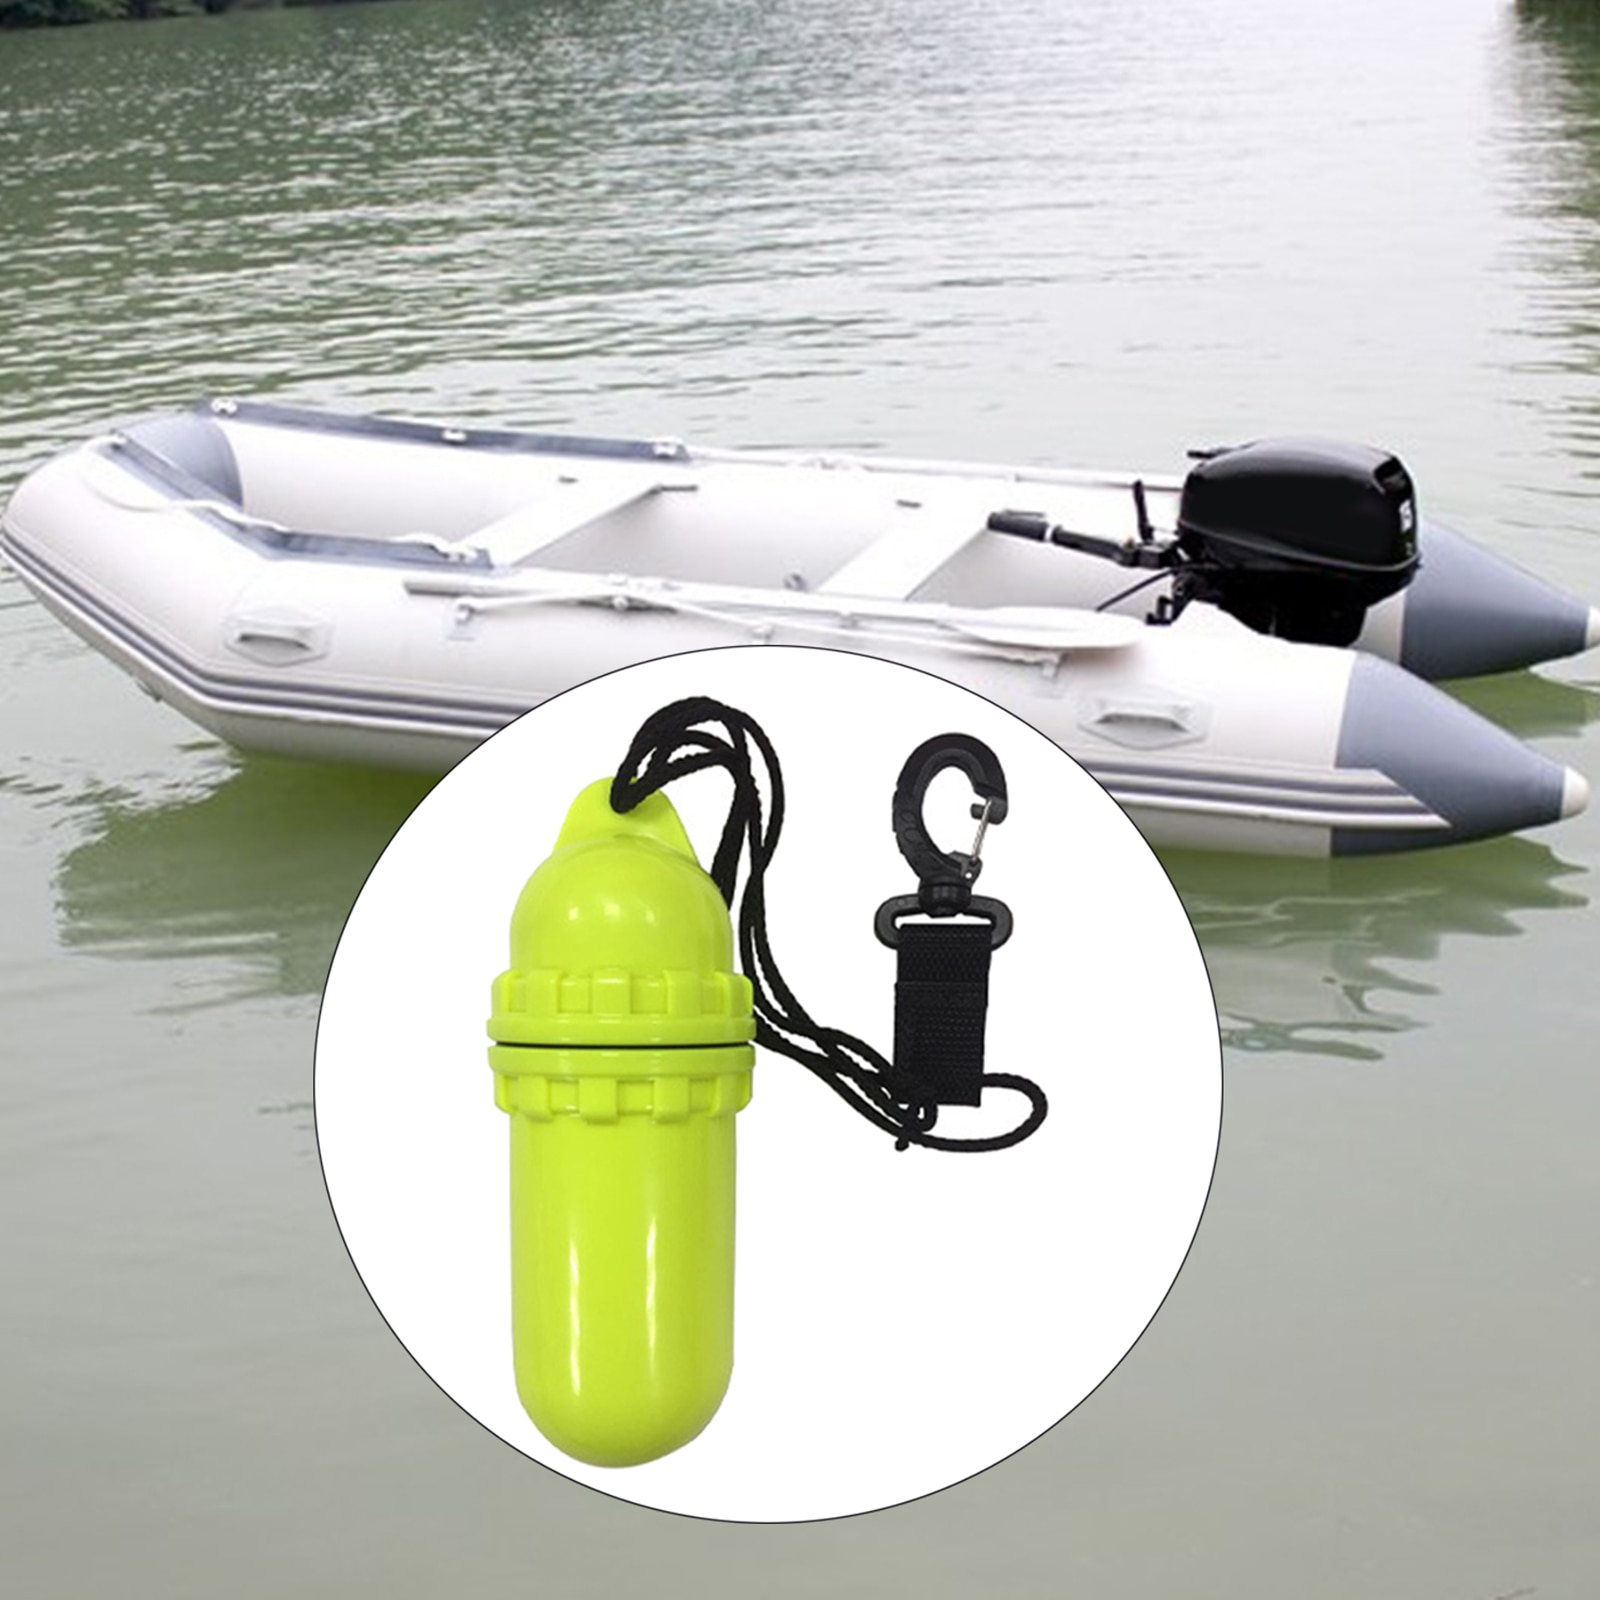 Floating Waterproof Dry Bag Gear Case for Kayaking,Rafting,Boating,Swimming